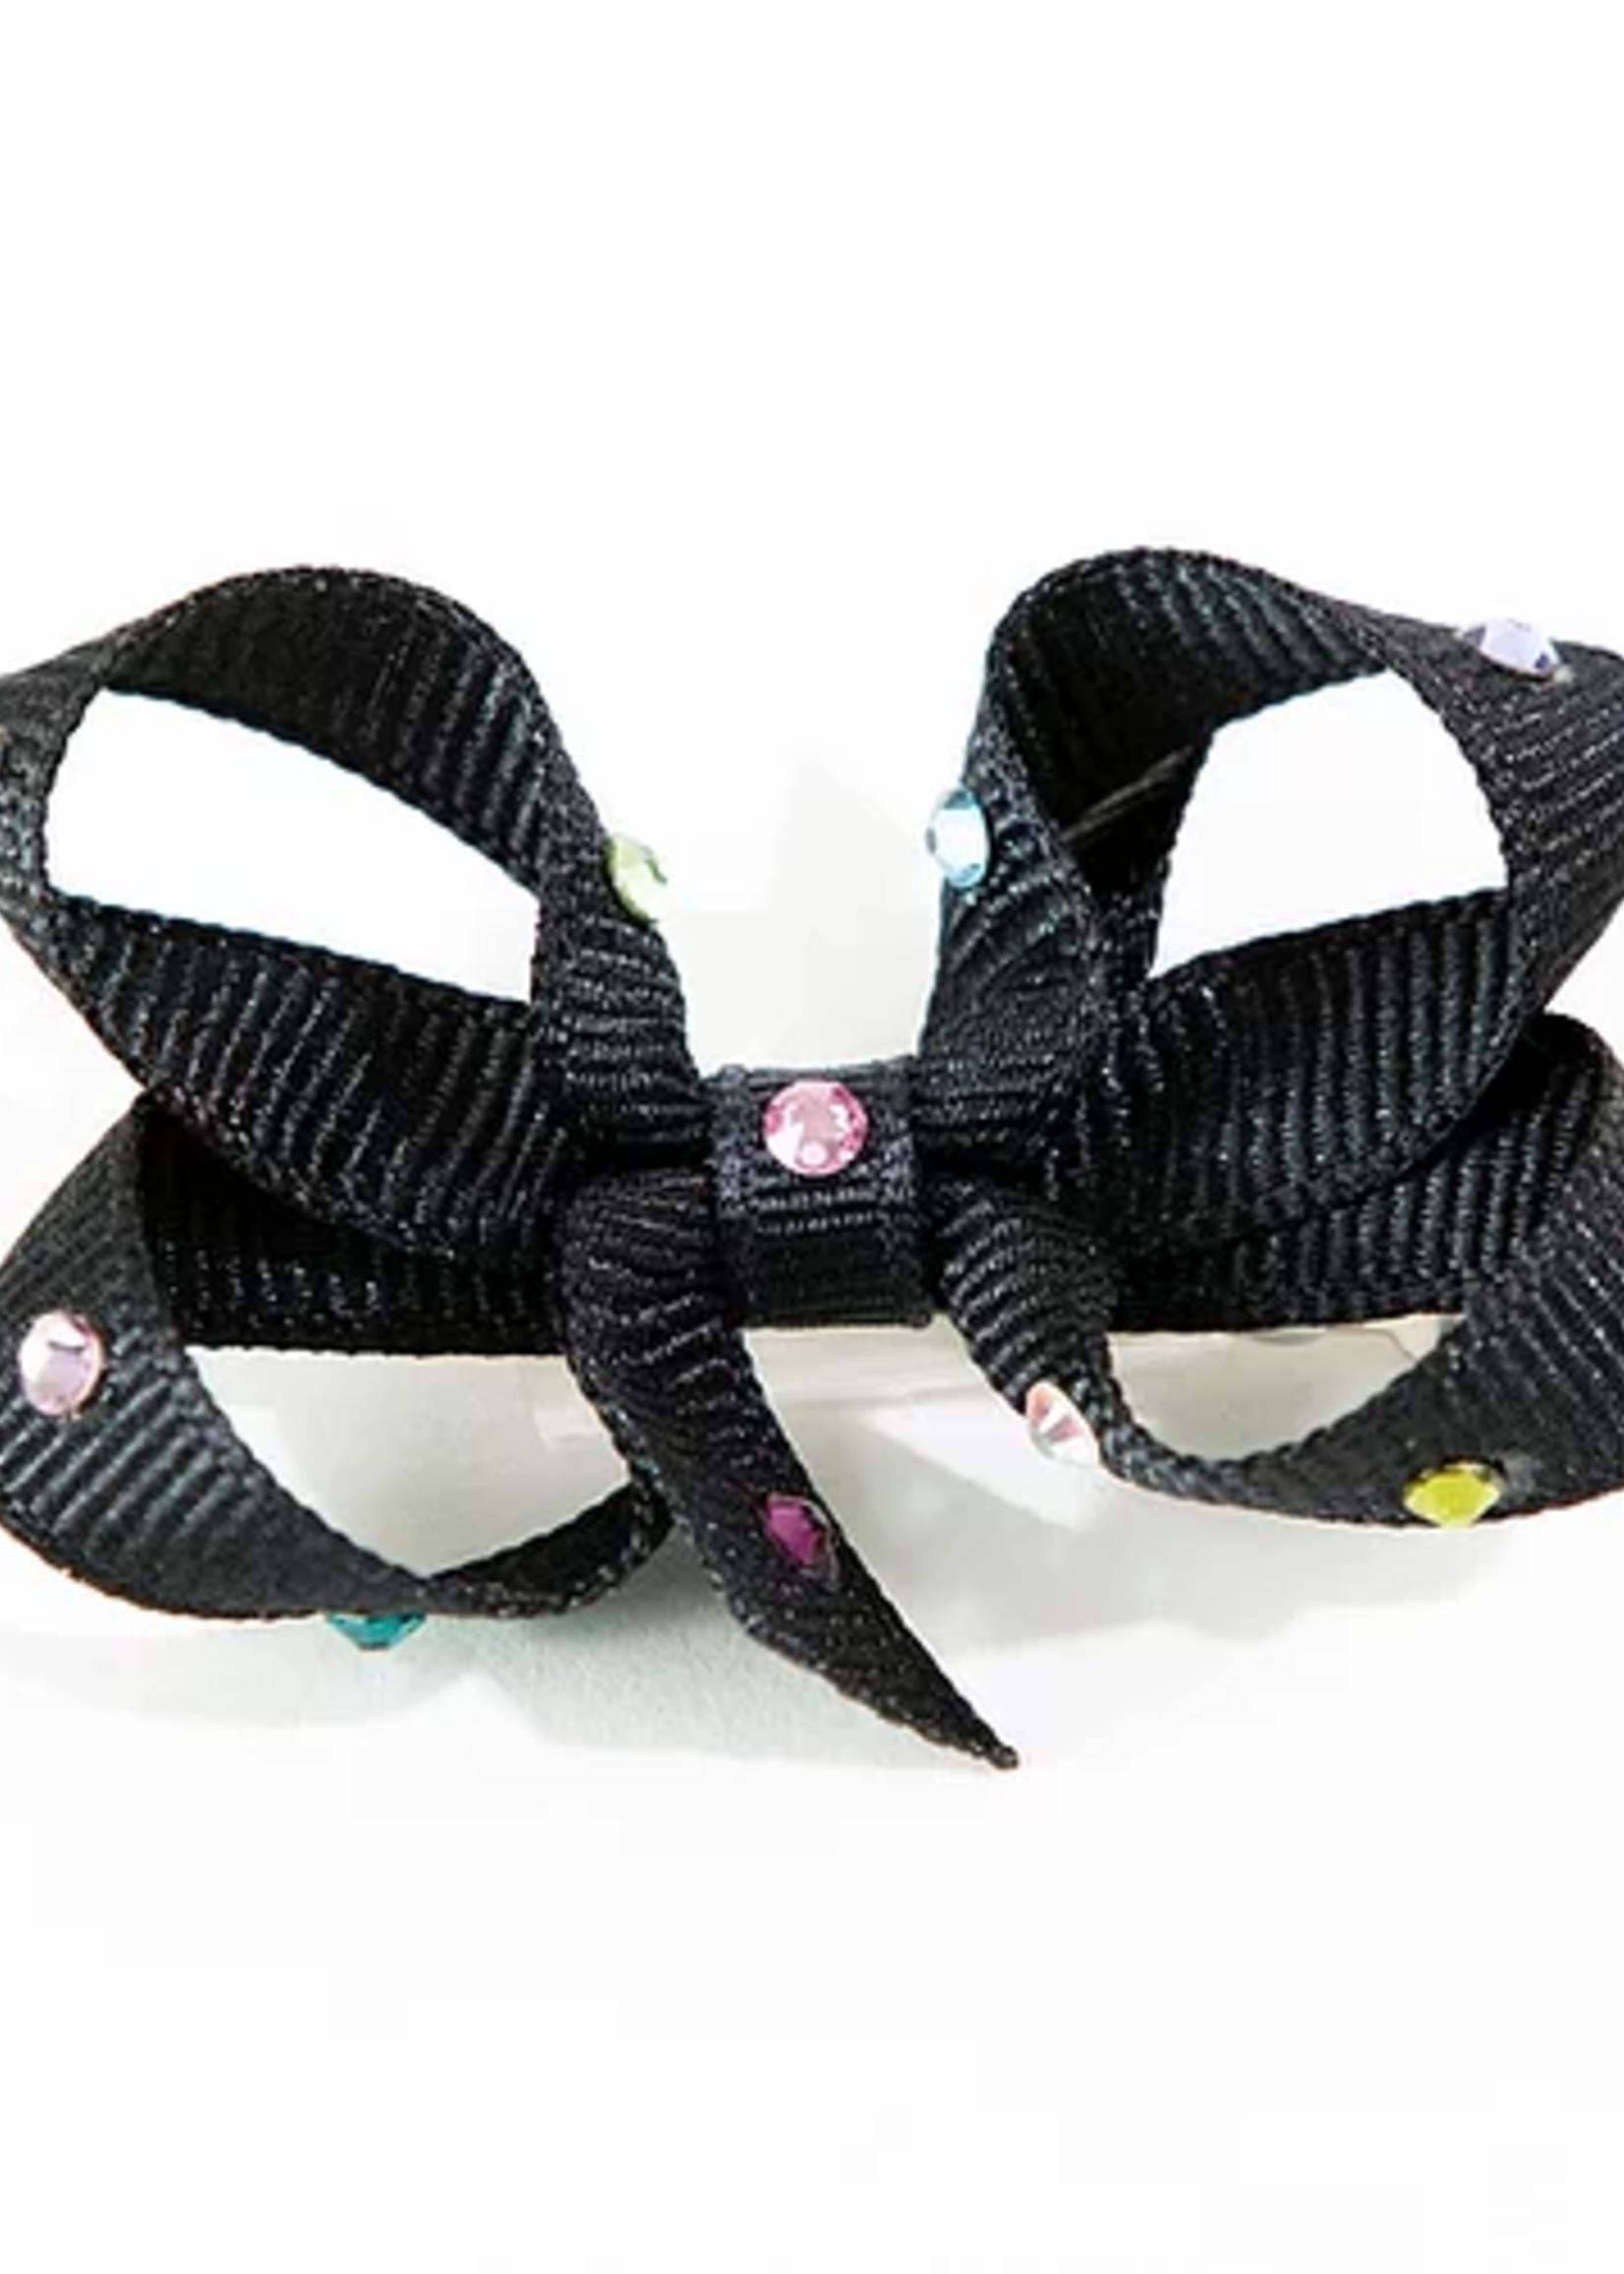 olilia Olilia Small Crystal Bow (Black Multi)